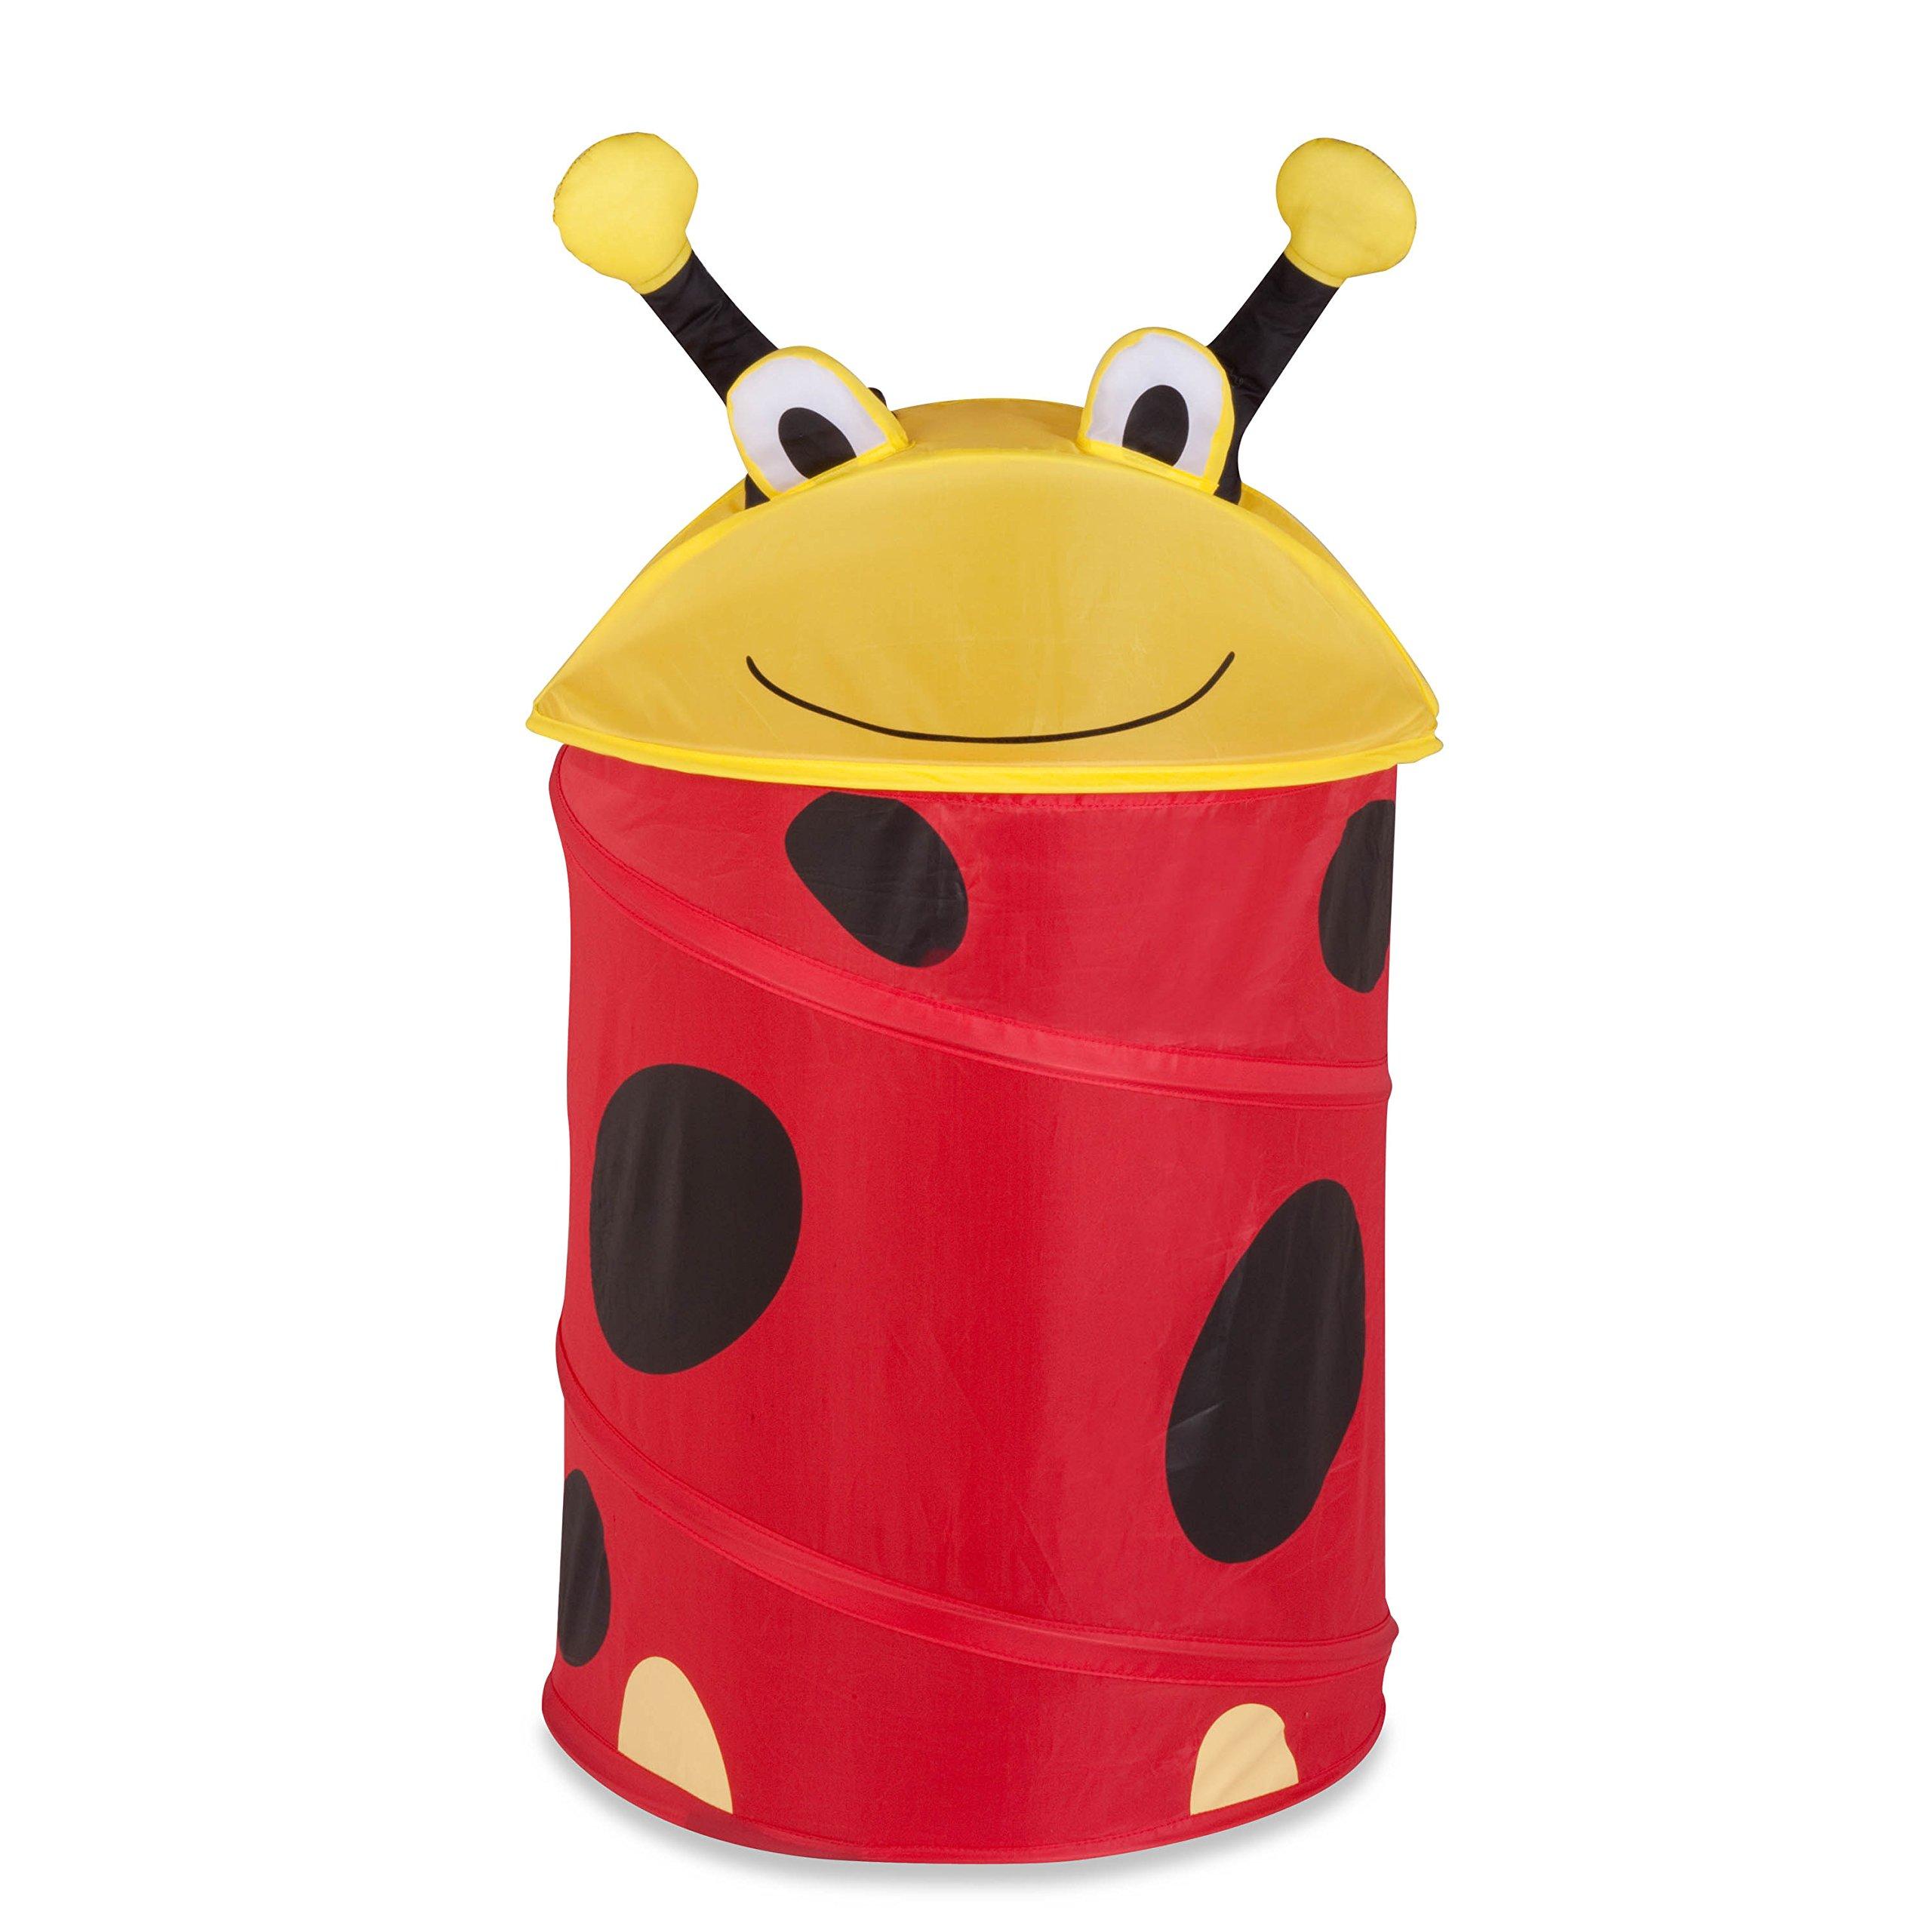 Honey-Can-Do HMP-02057 Medium Kid's Pop-Up Hamper - Lady Bug